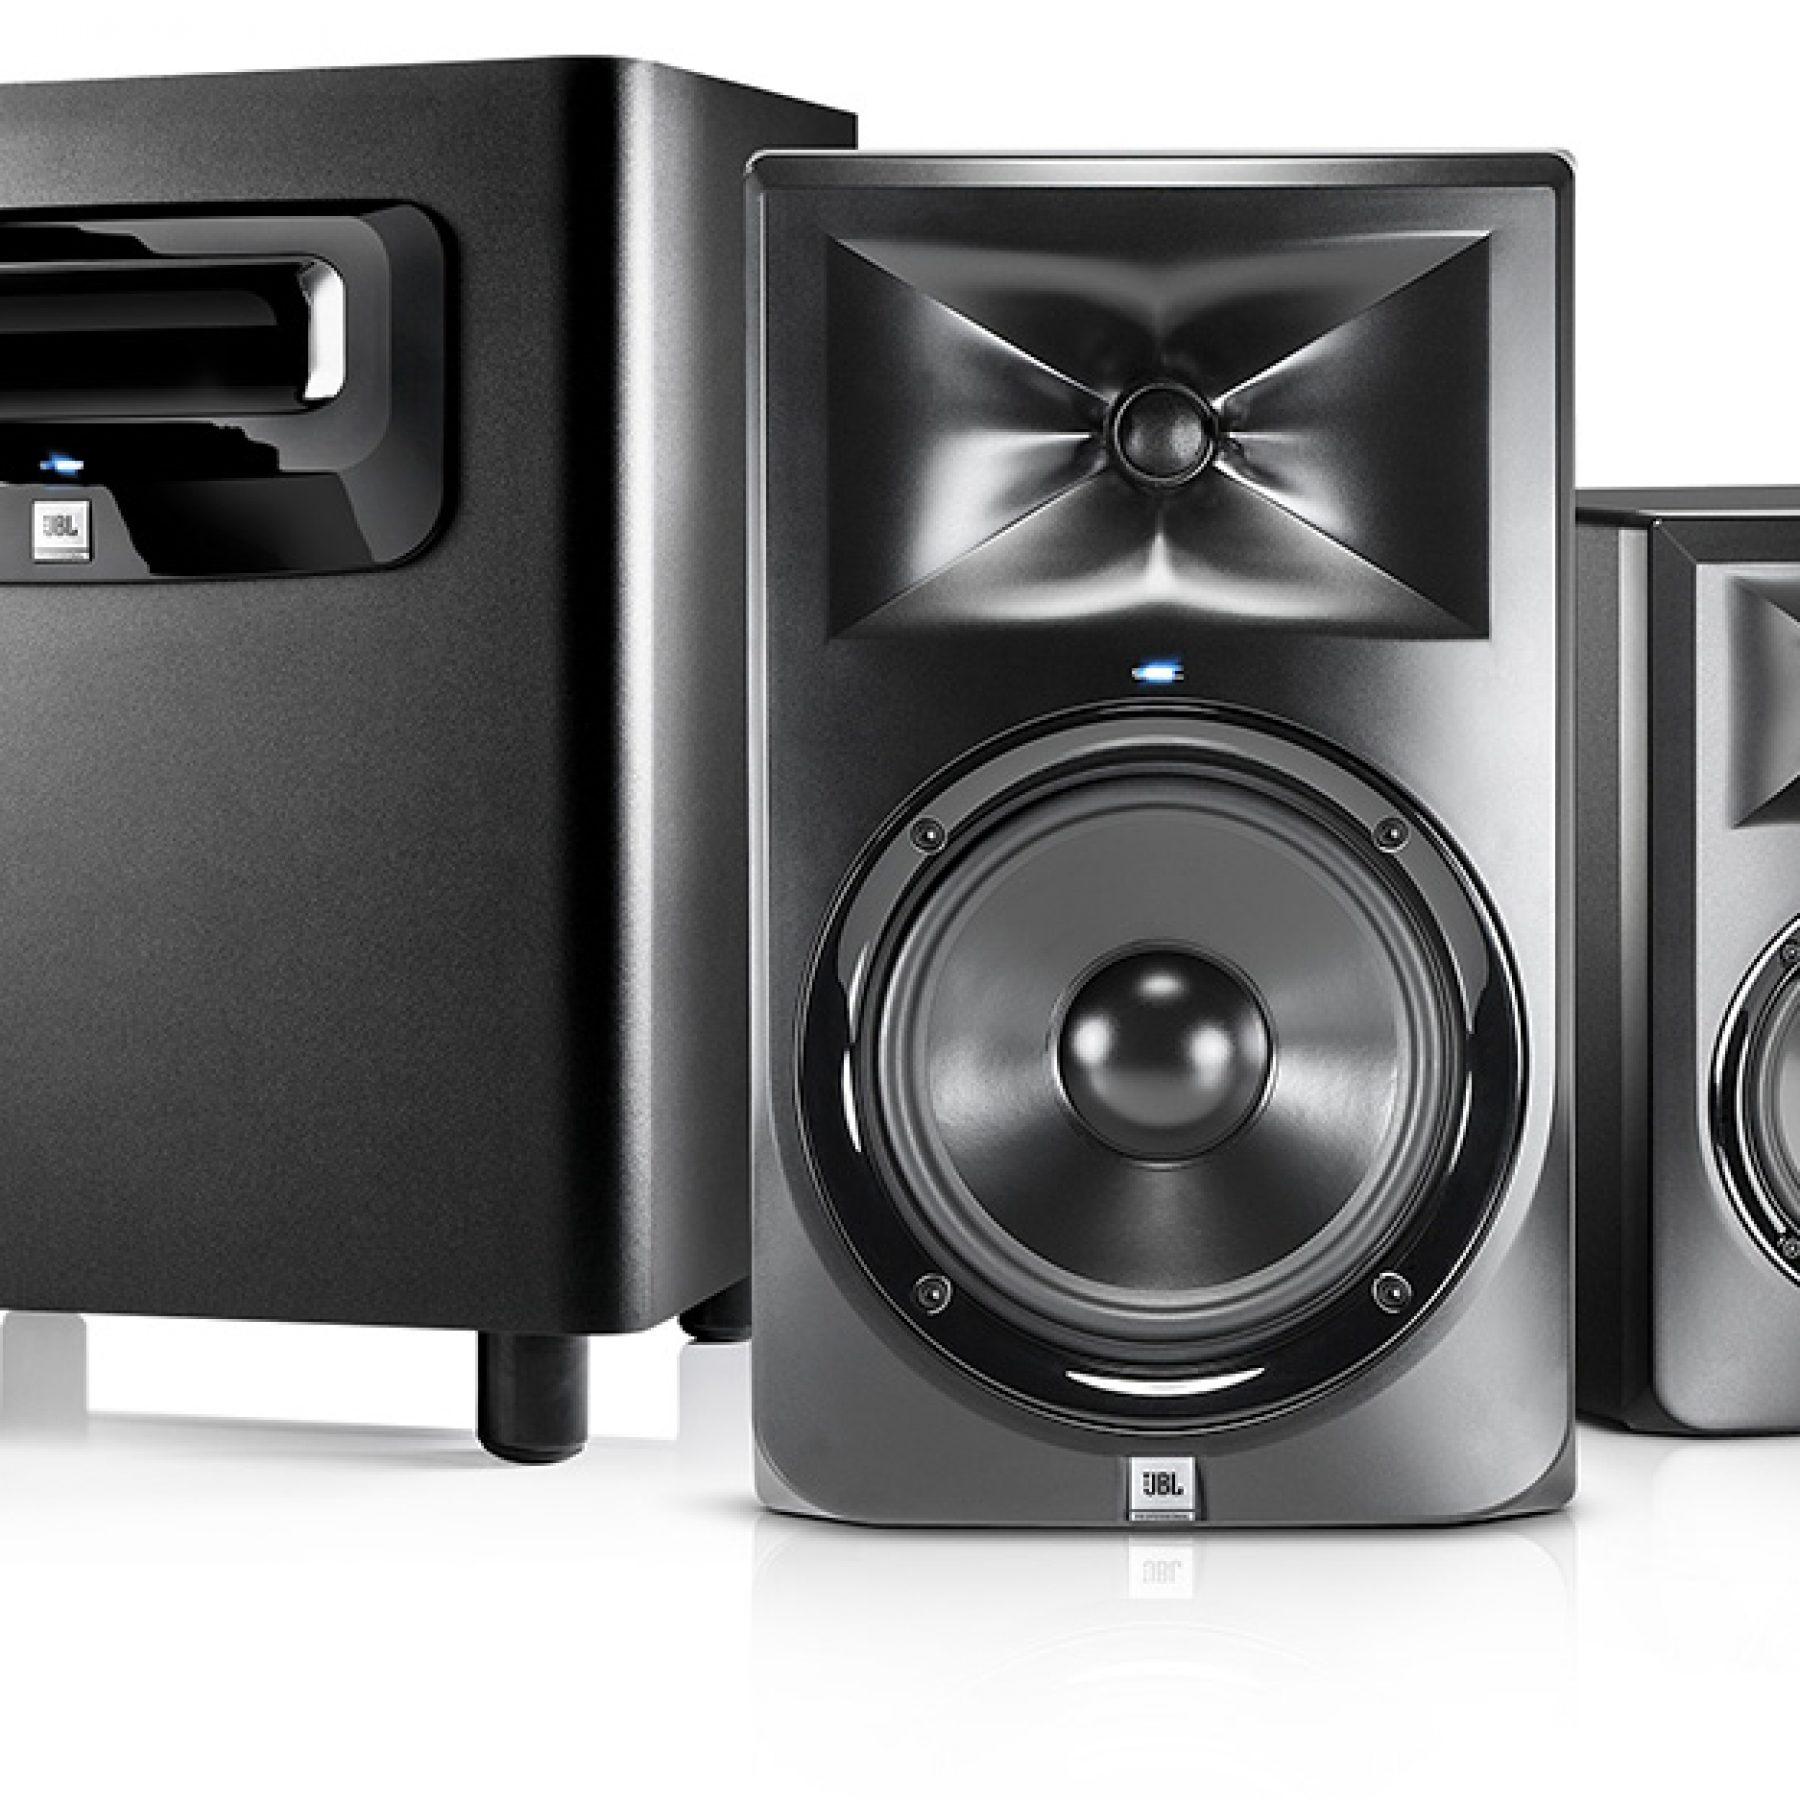 jbl 3 series monitors sub audiotechnology. Black Bedroom Furniture Sets. Home Design Ideas